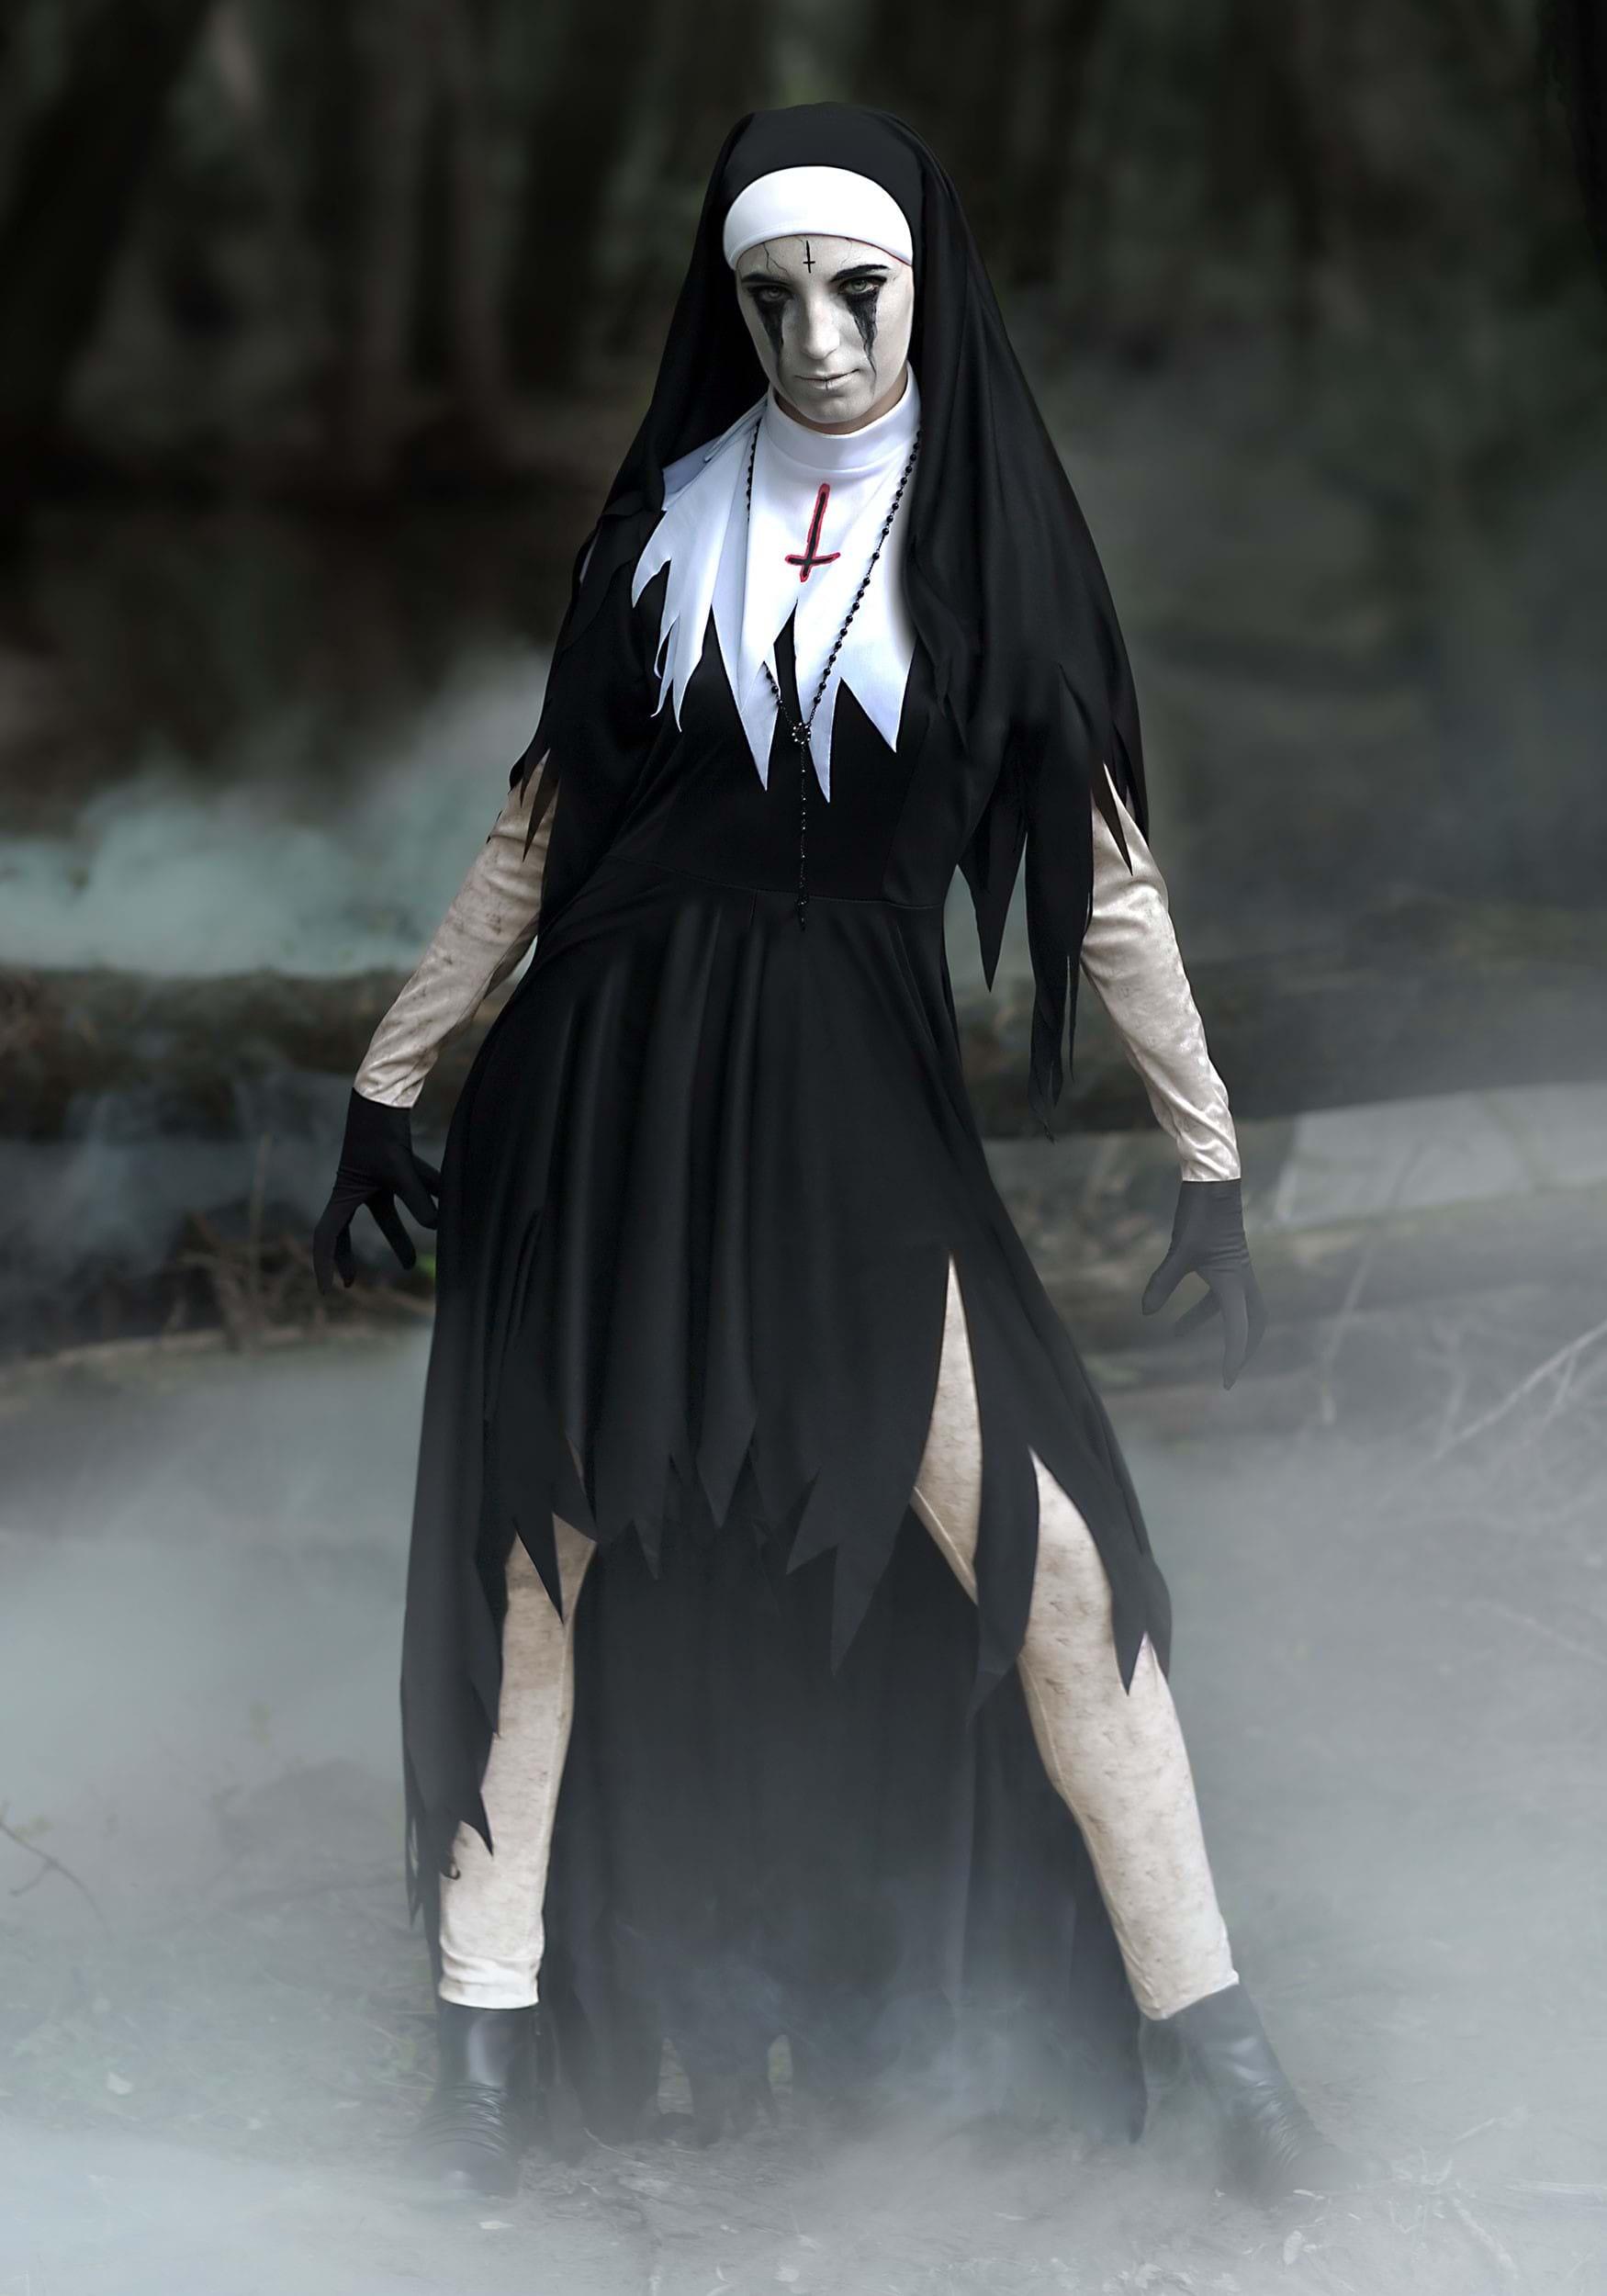 Scary Halloween Costumes - Kids, Adult Scary Halloween Costume Ideas